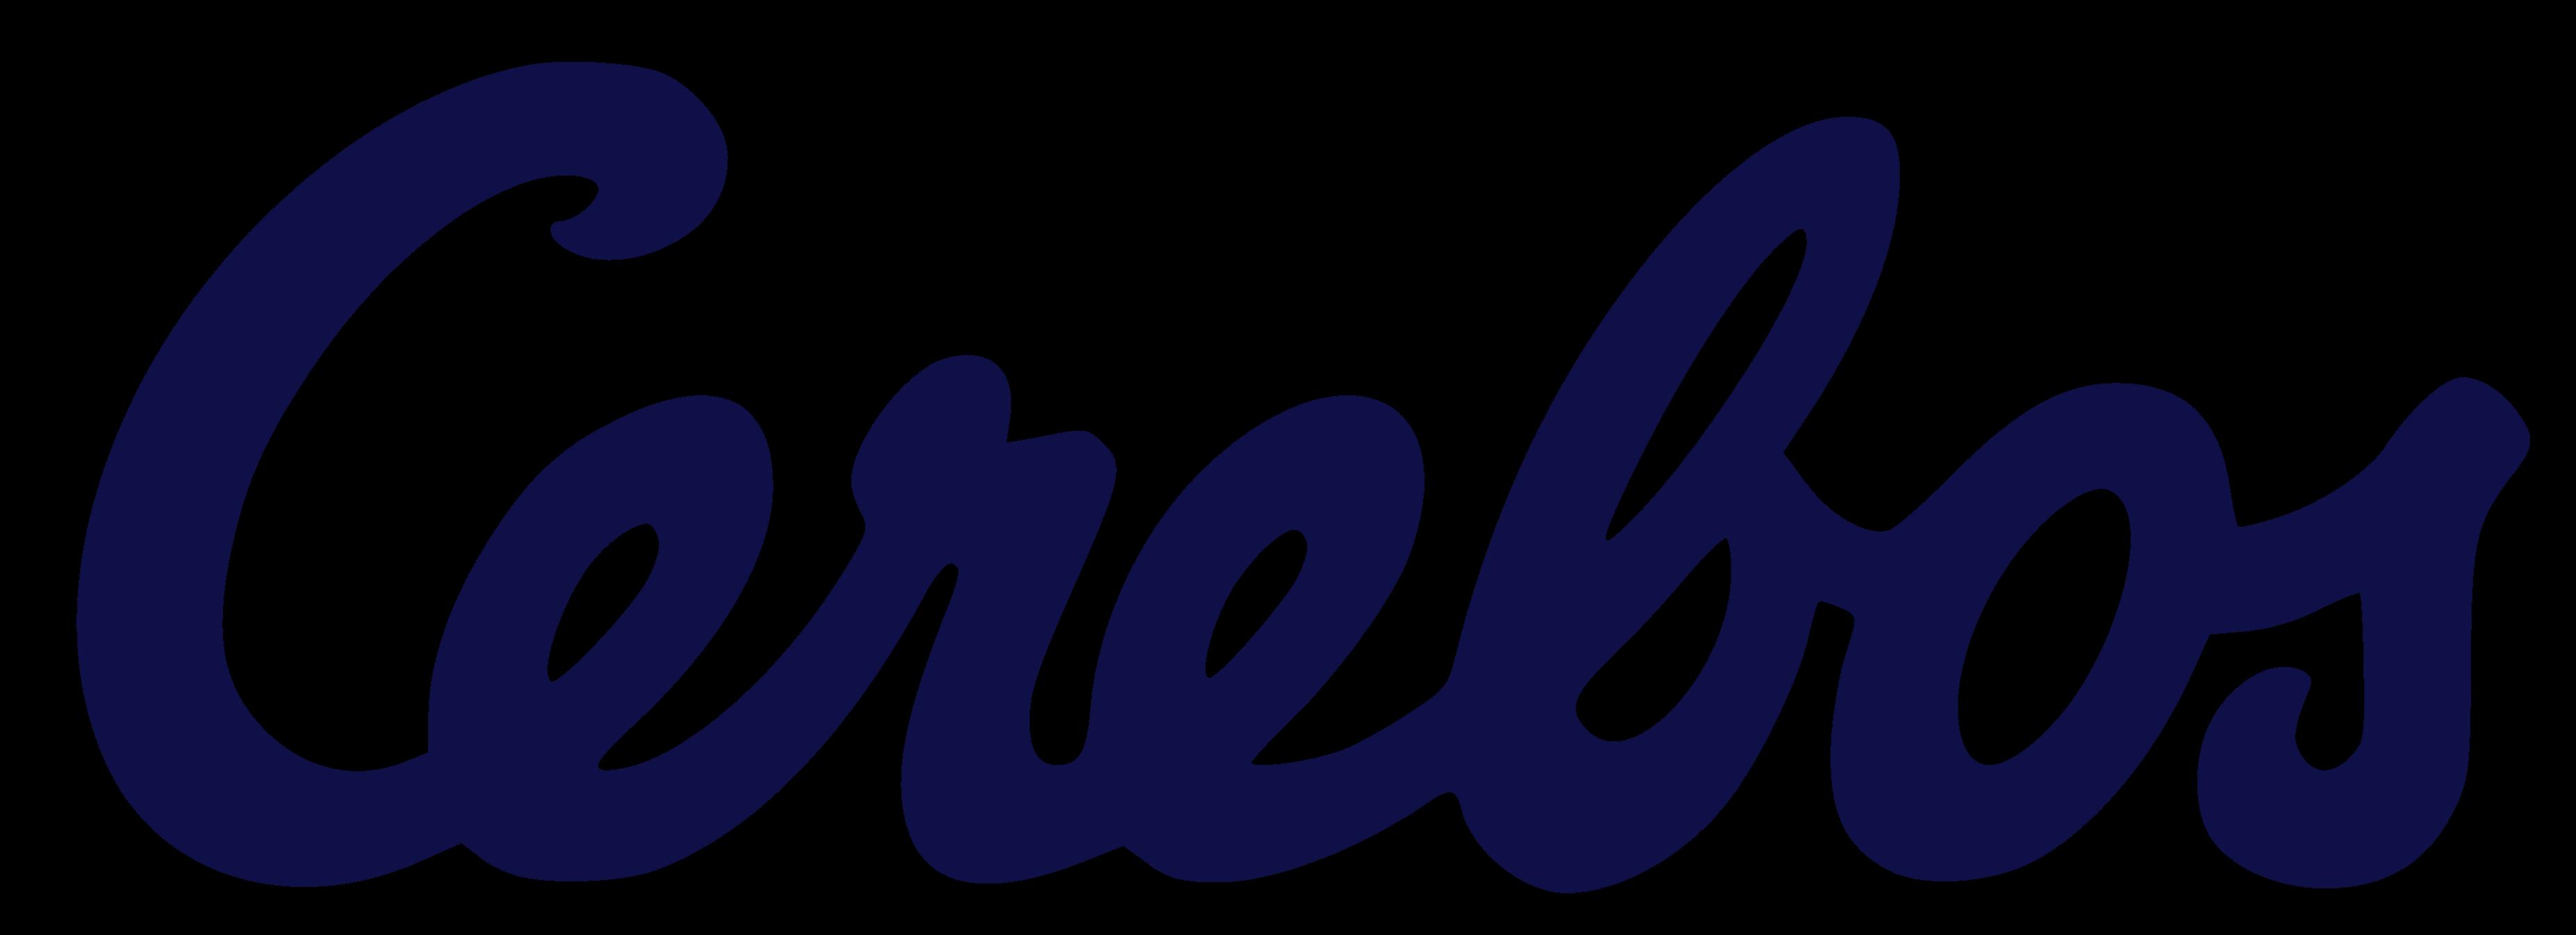 Cerebos_logo